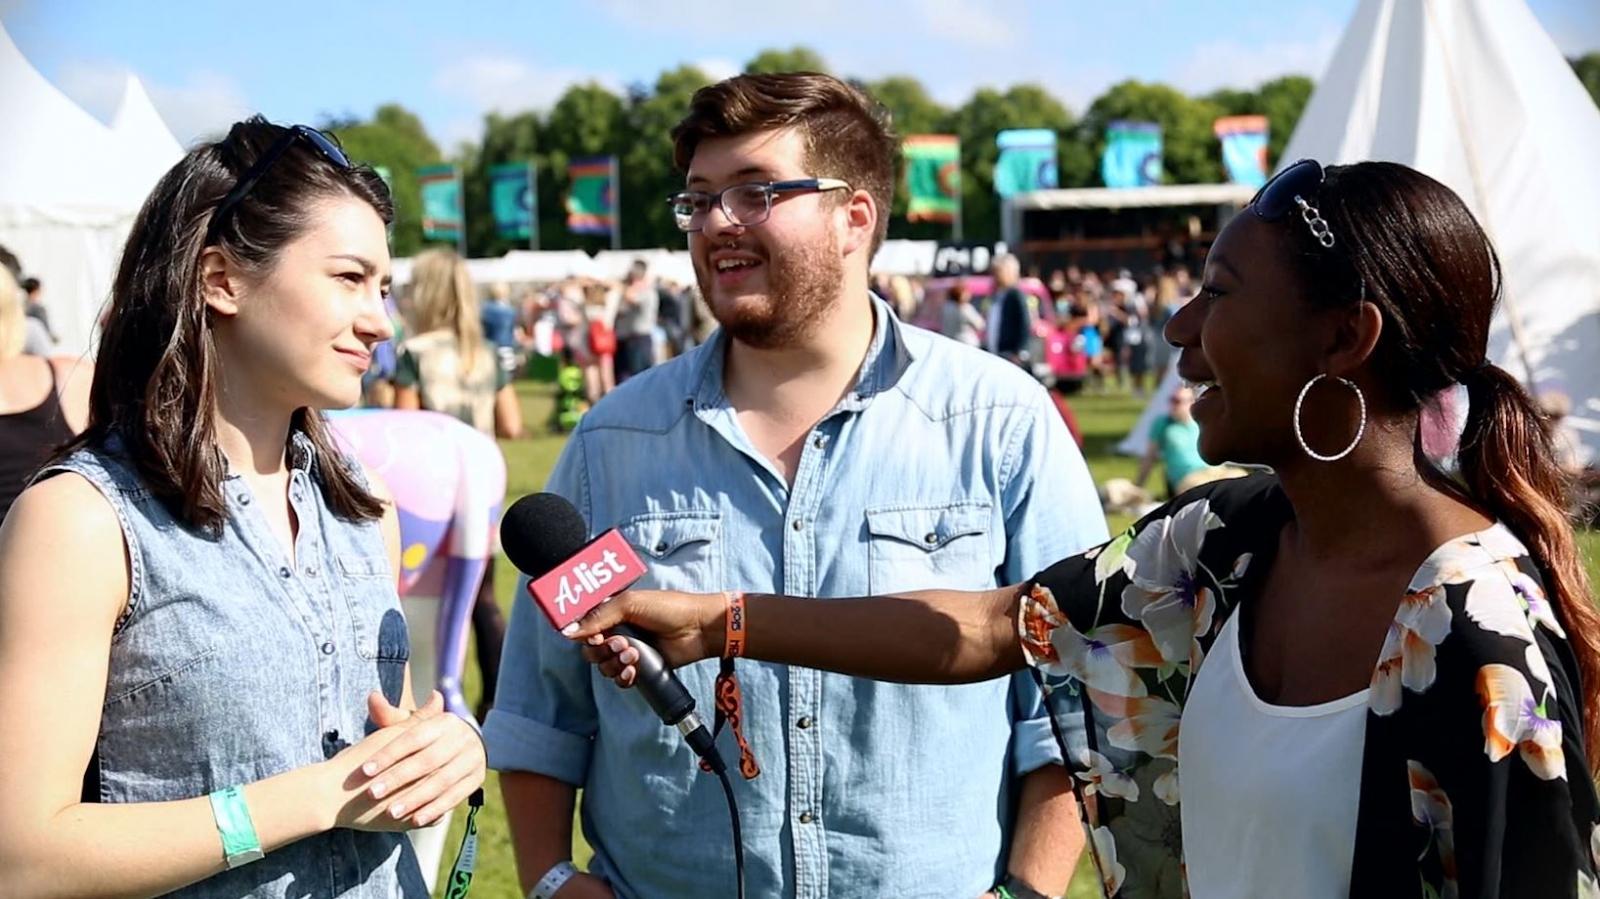 Isle of Wight Festival 2015 Youtube Sensations